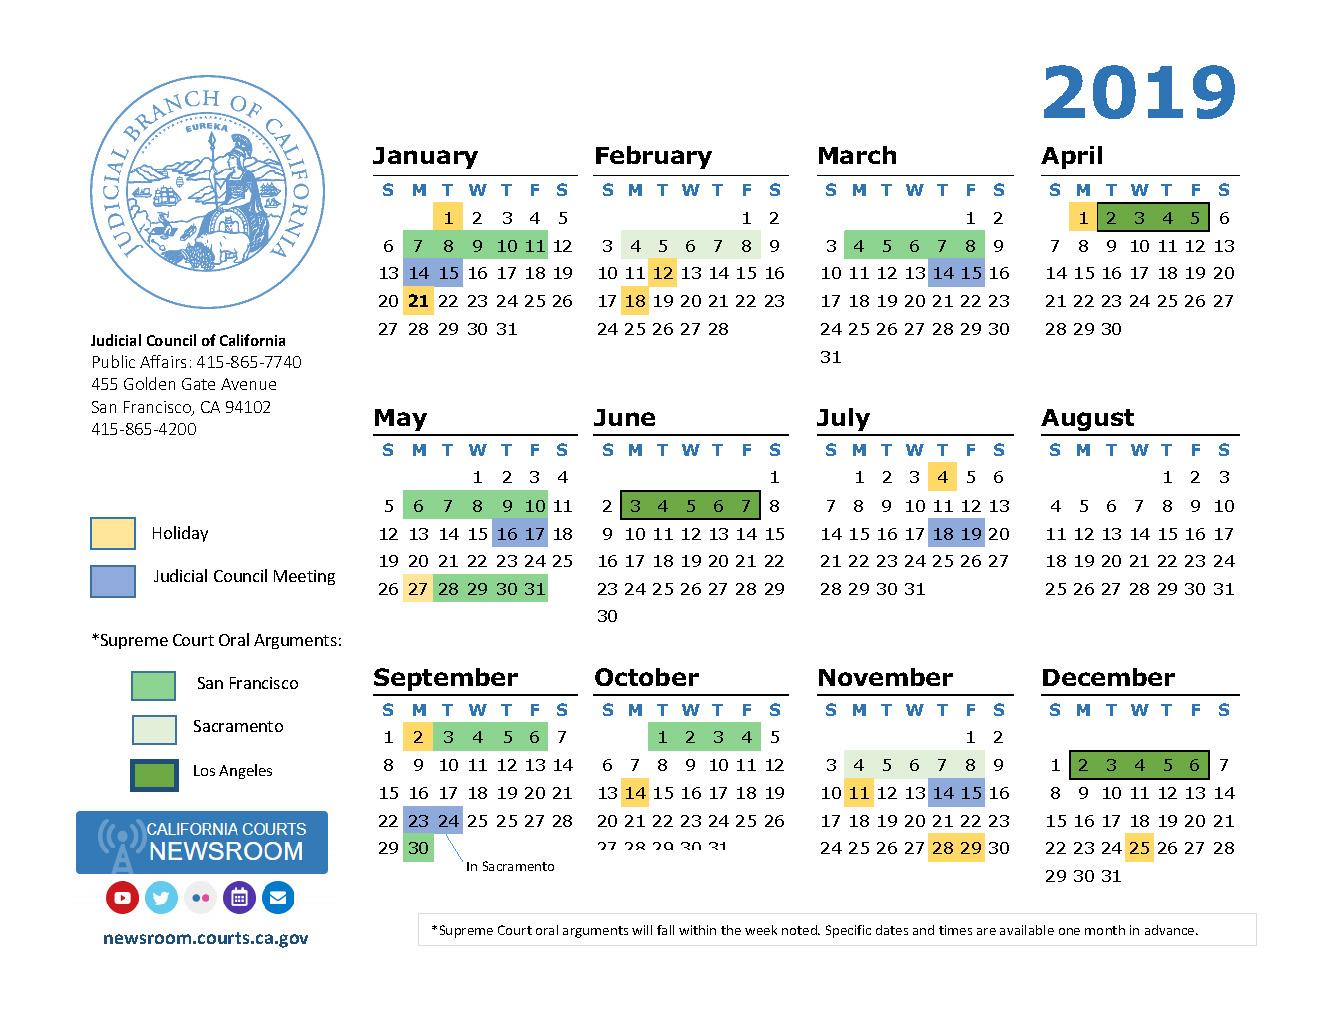 2019 California Courts Calendar | California Courts Newsroom